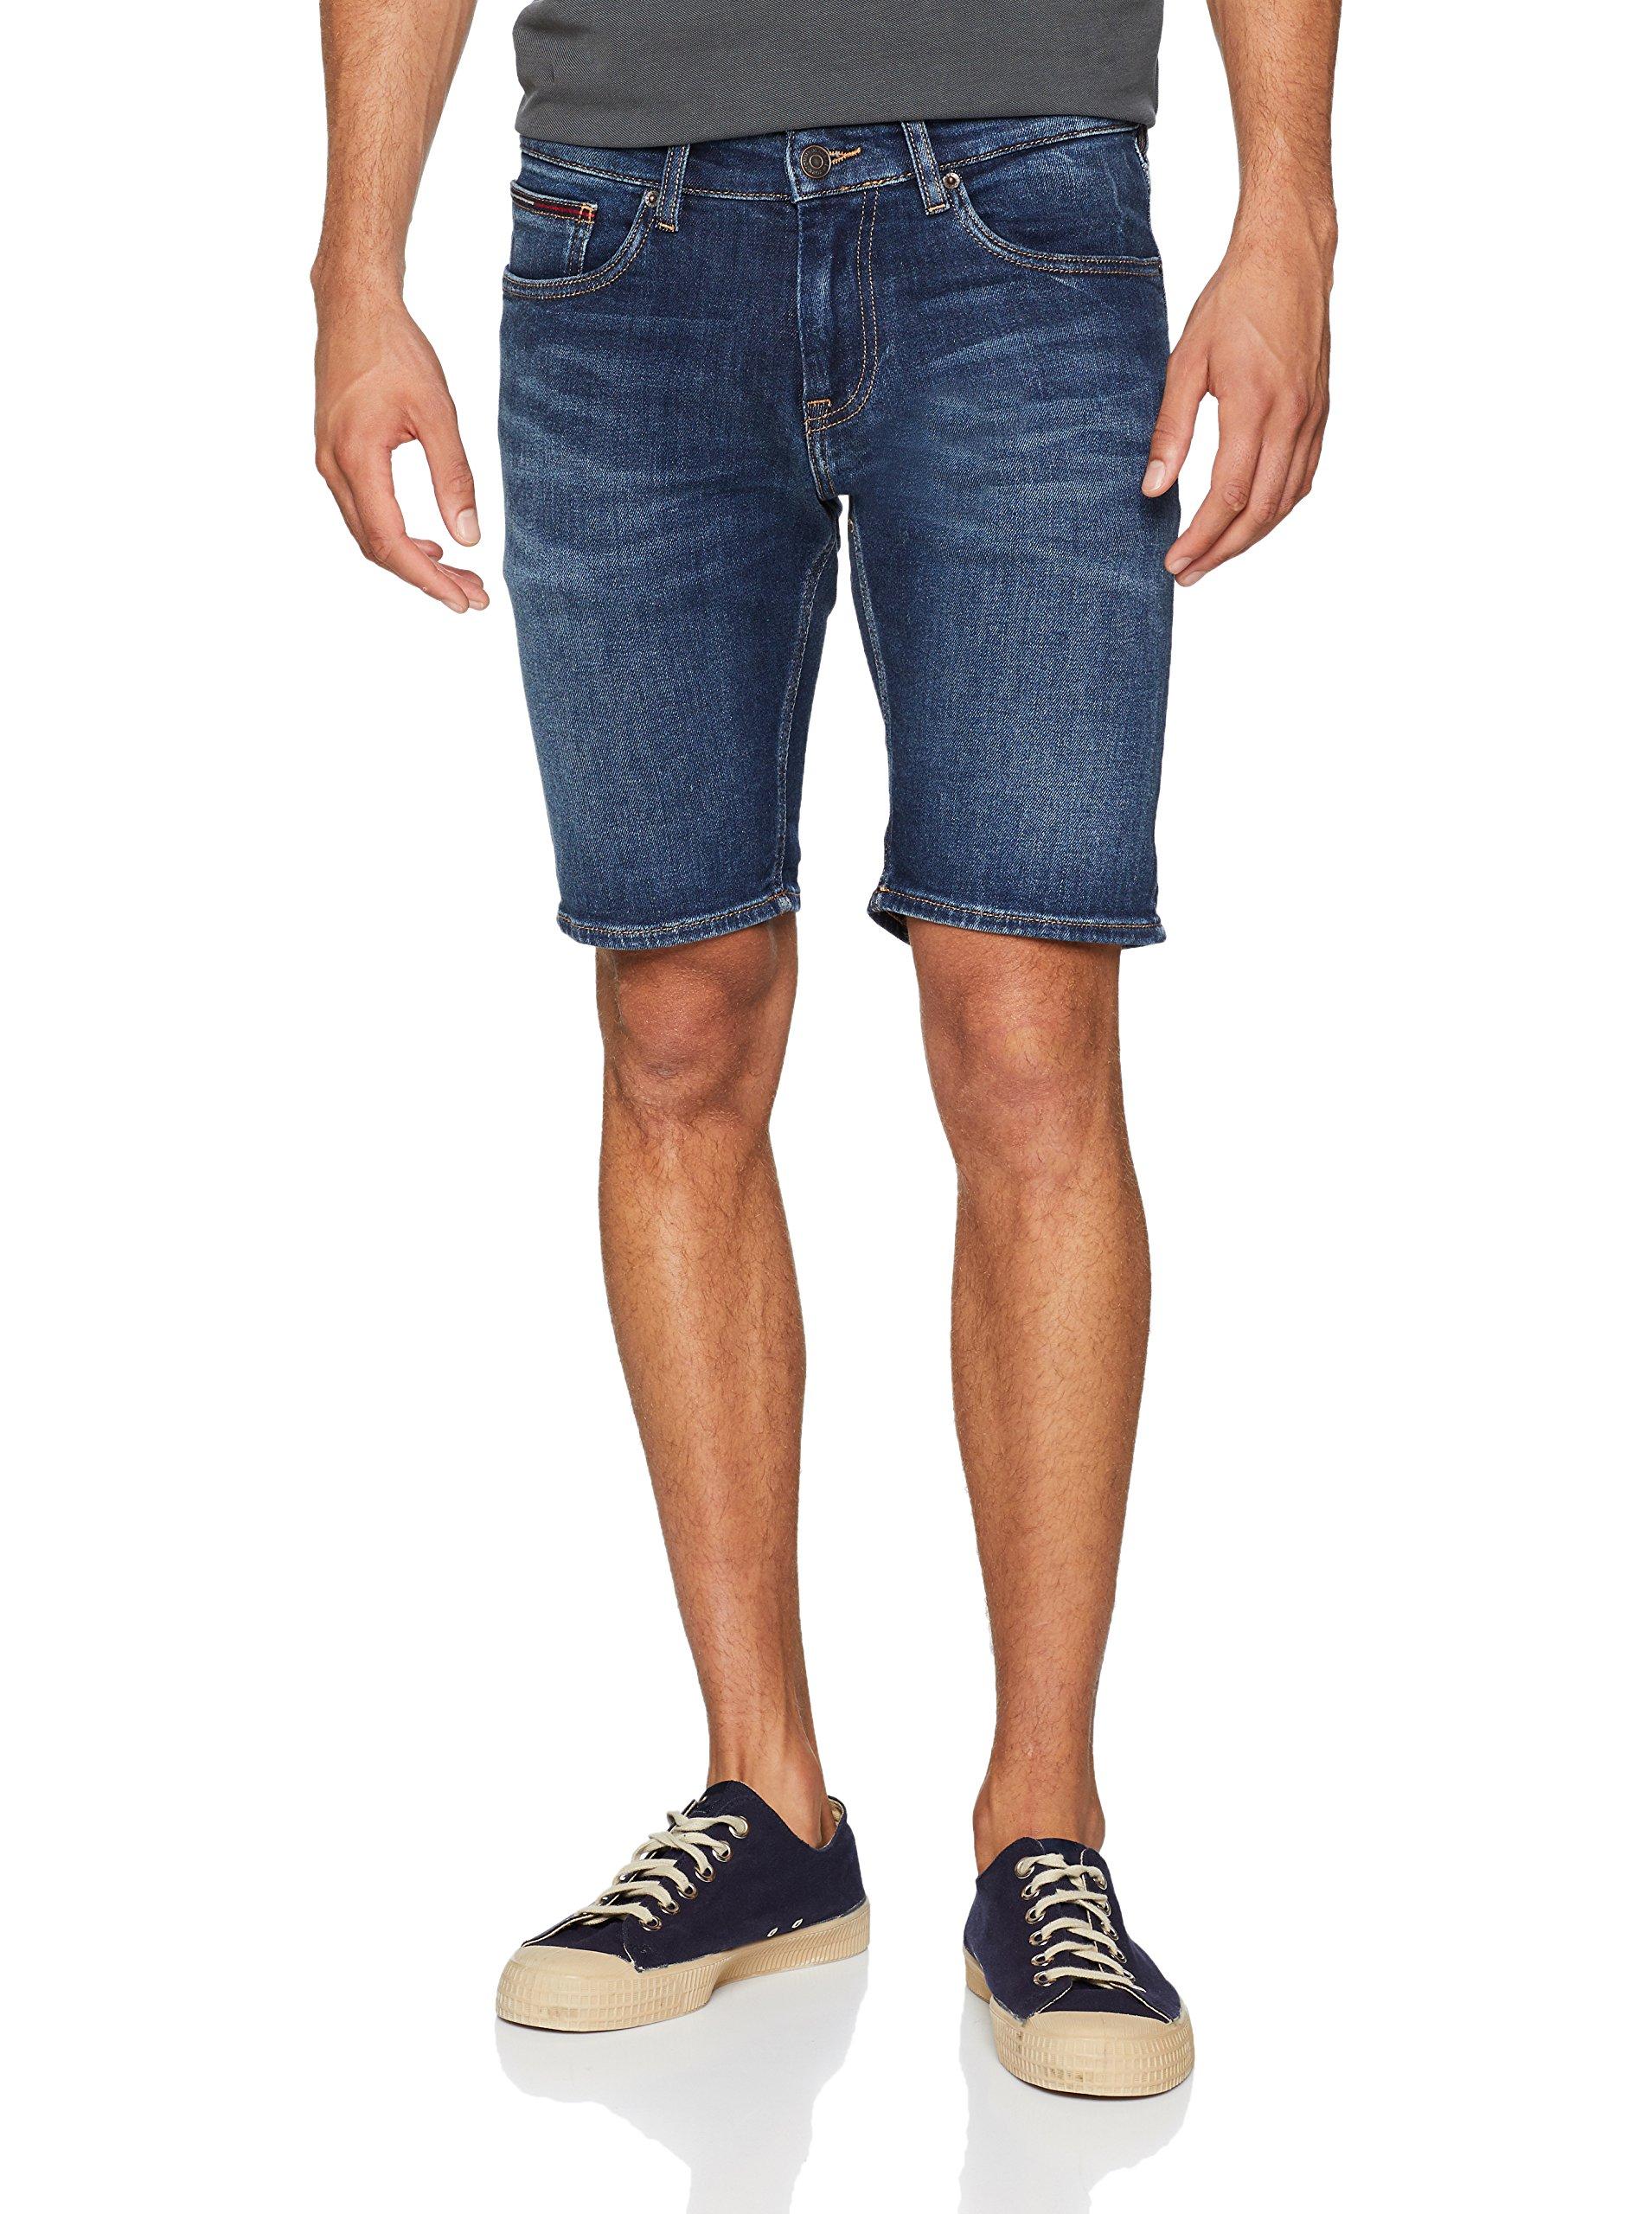 Bleupaseo Tommy Homme Short Com Jeans Dark Blue 911W31 Scanton stdhQCr